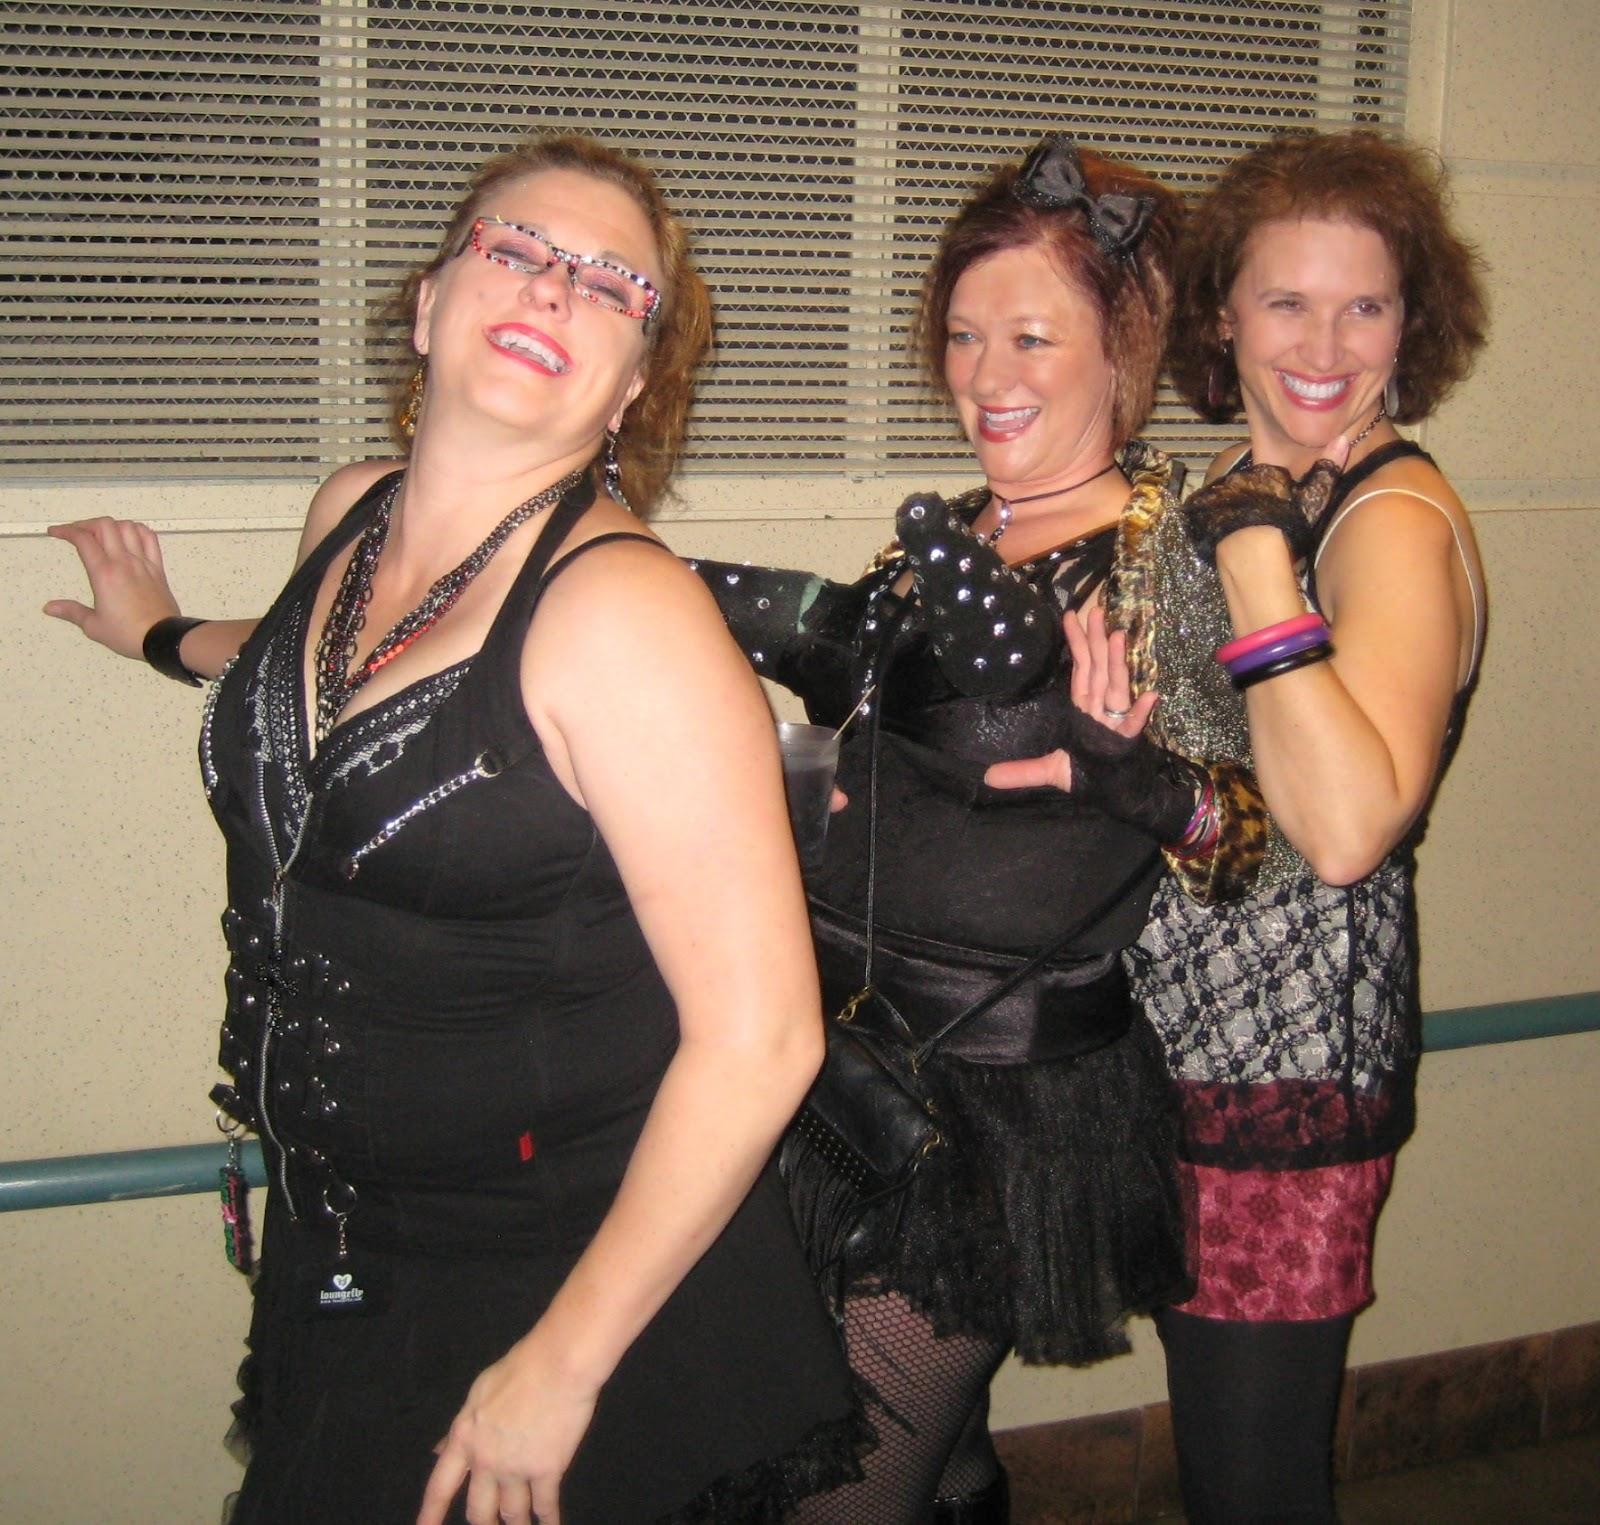 http://3.bp.blogspot.com/-1TDCBsn1vHY/ULT_VFxNMKI/AAAAAAAAo5M/LrHDtsqqpw8/s1600/Madonna+studded+cone+bra+concert+in+Minneapolis+picture.jpg